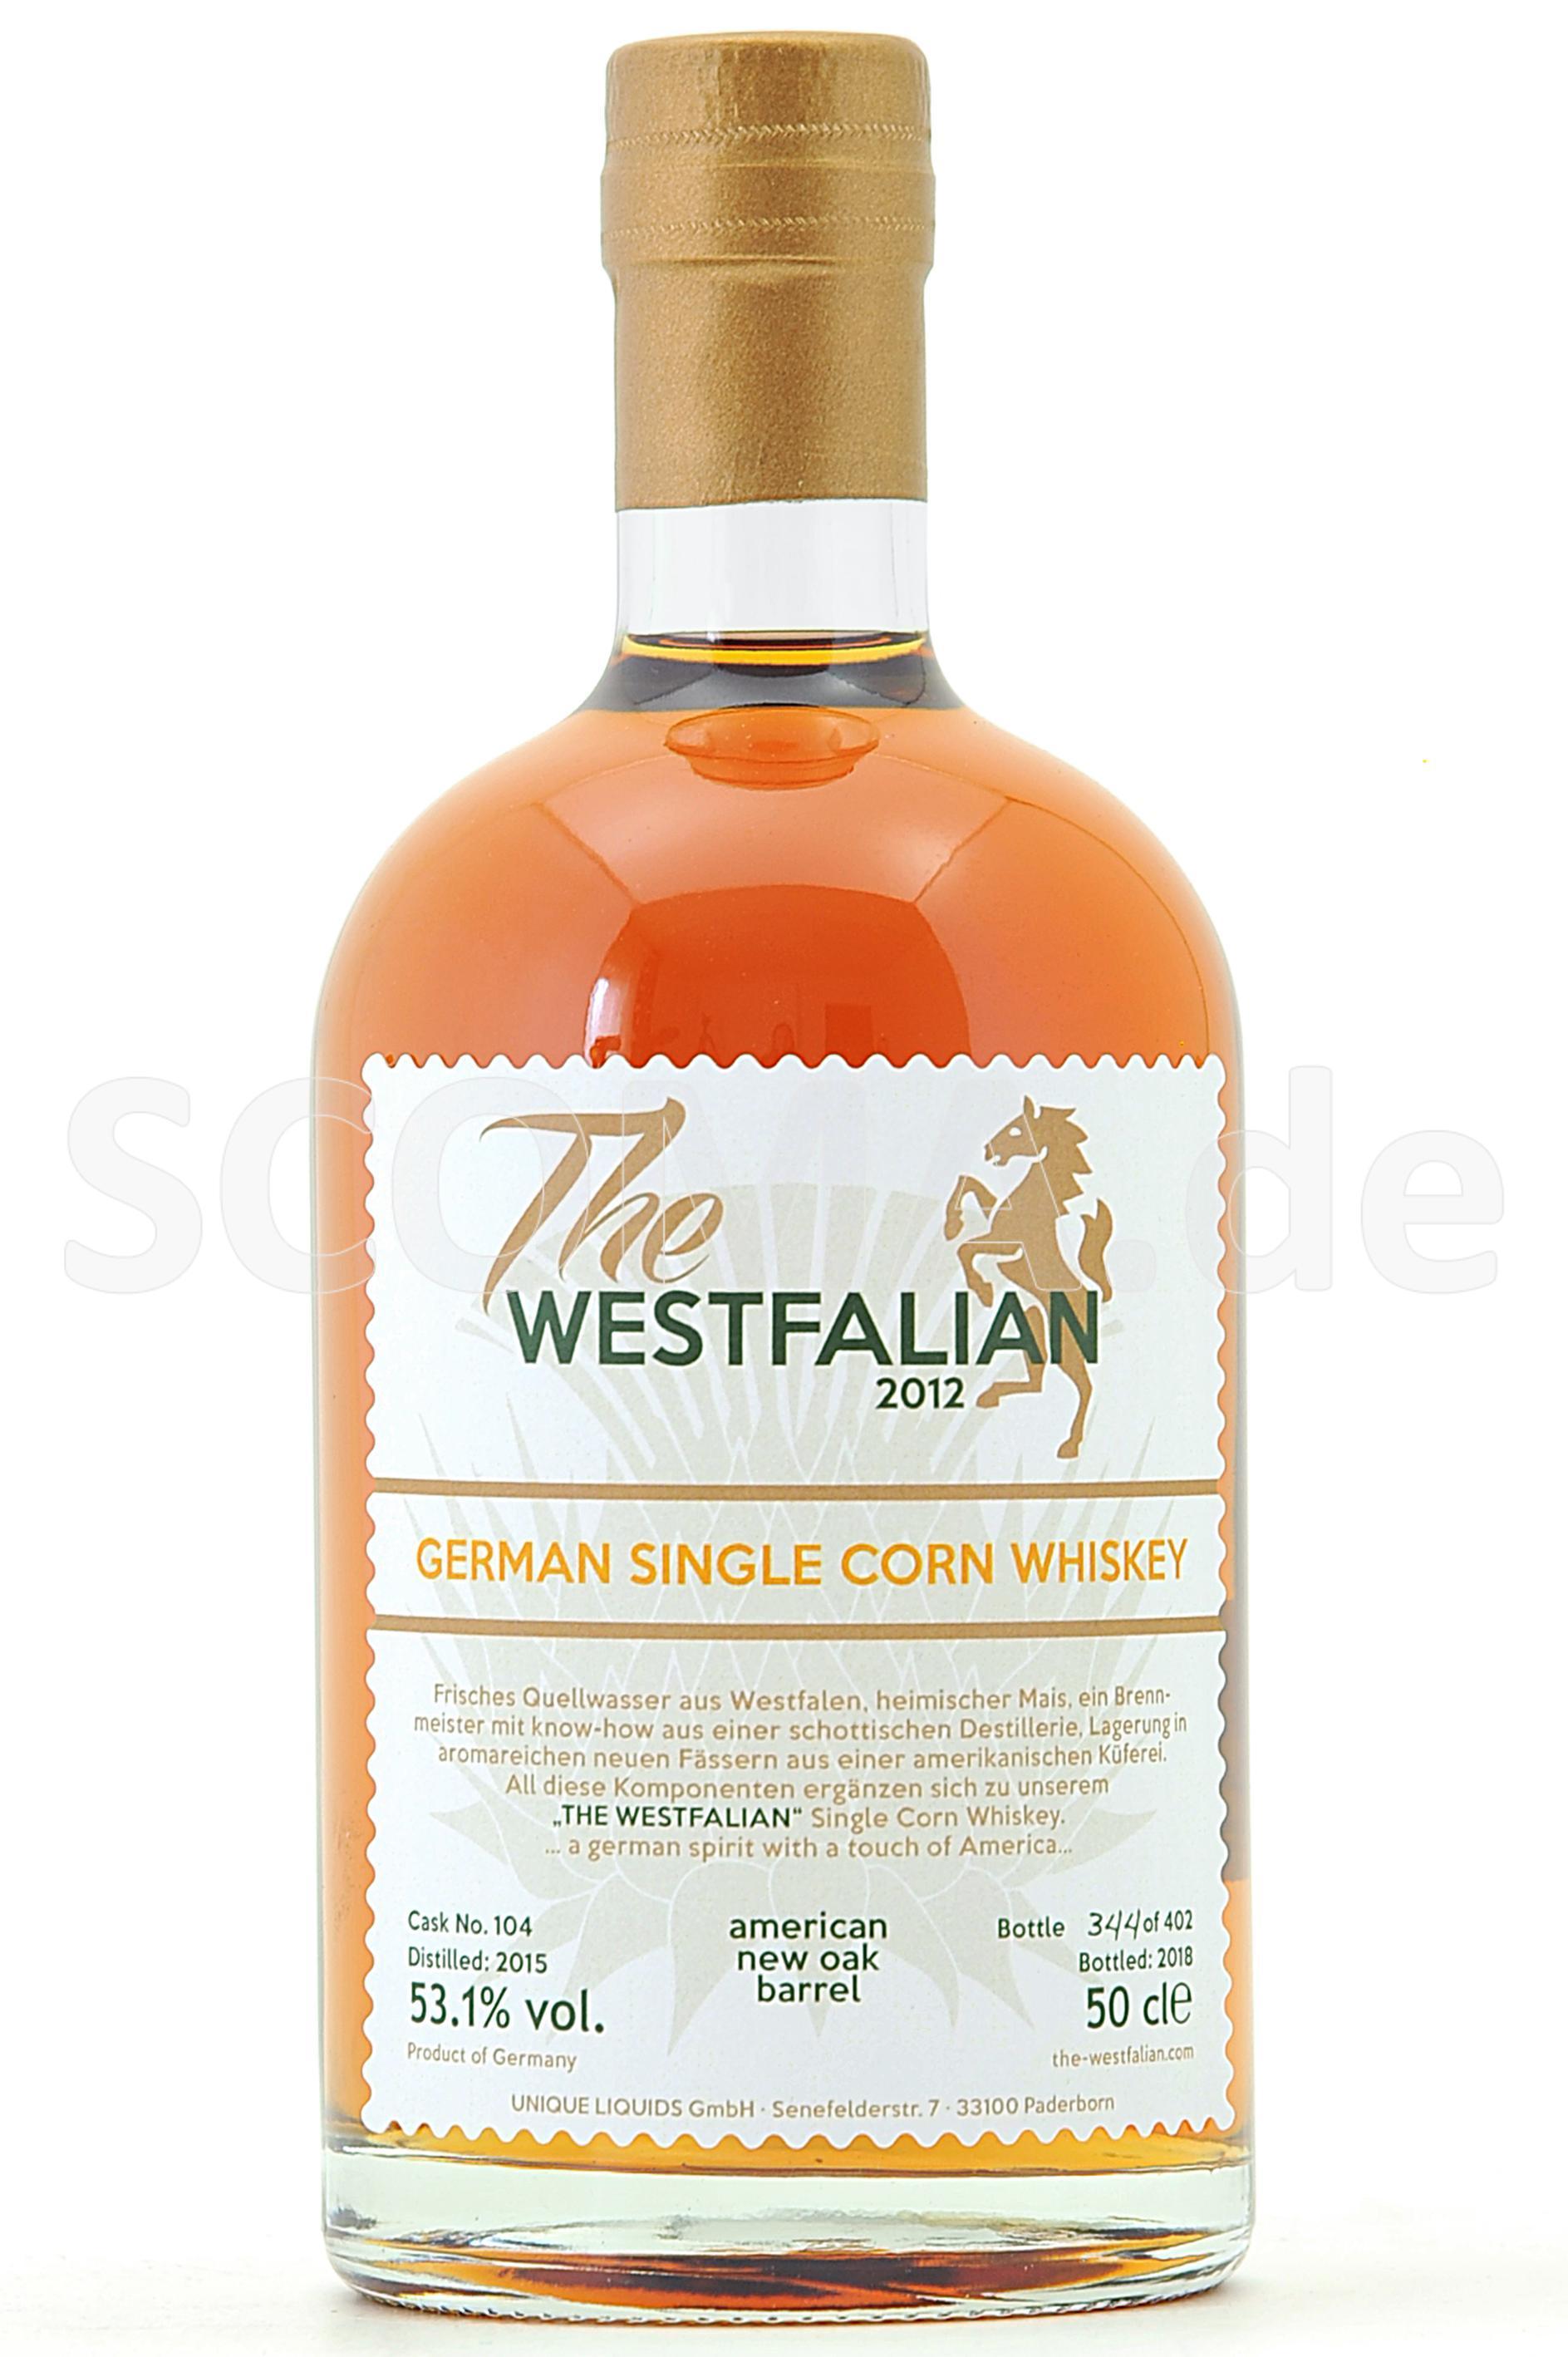 The Westfalian Corn Whisky 201...